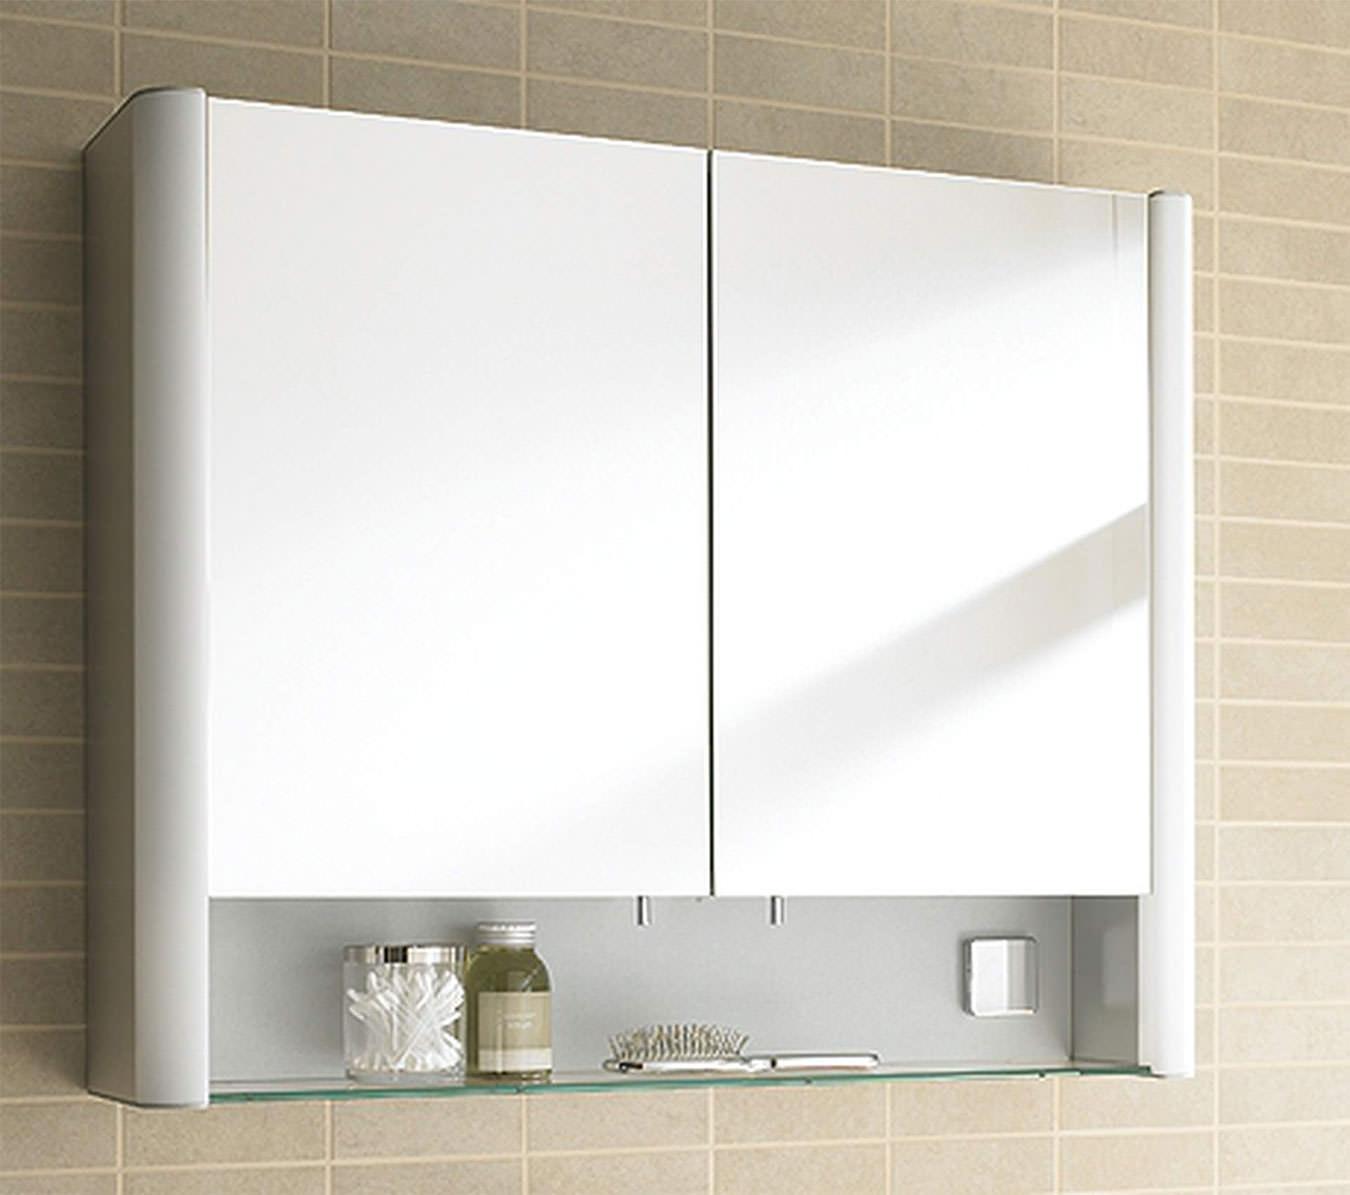 qs supplies bathroom furniture bathroom cabinets mirrored cabinets